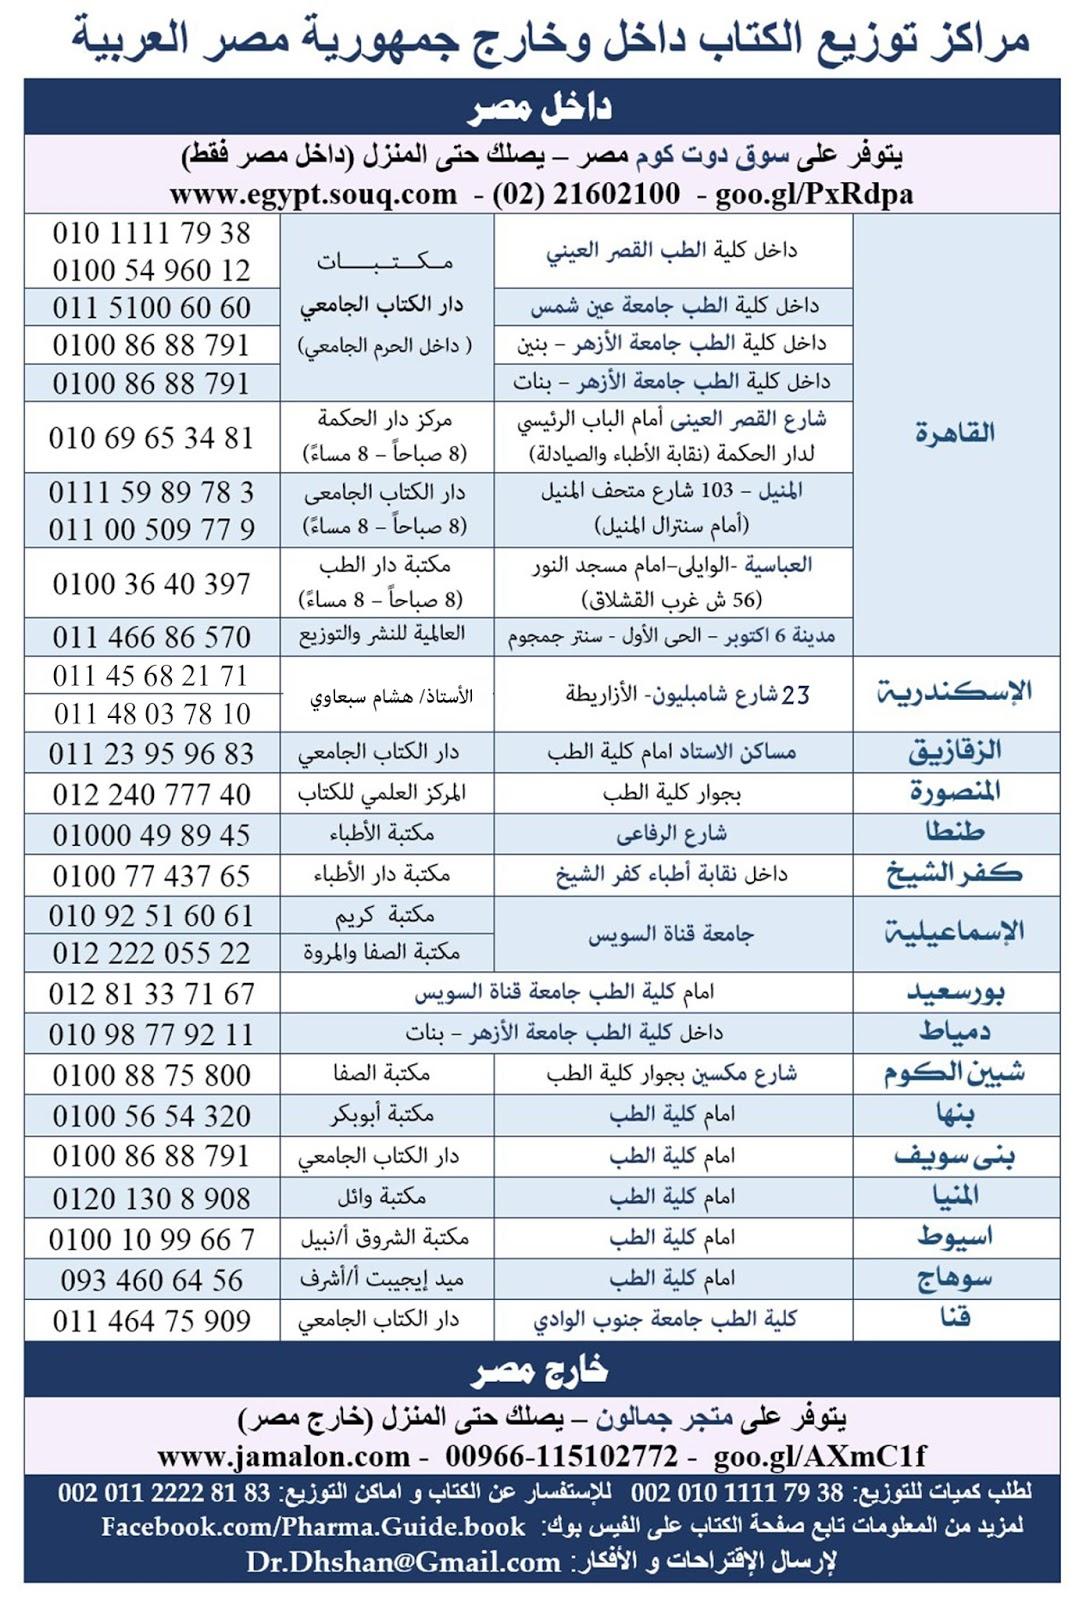 Pharmatube: Pharma Guide Pre-Work